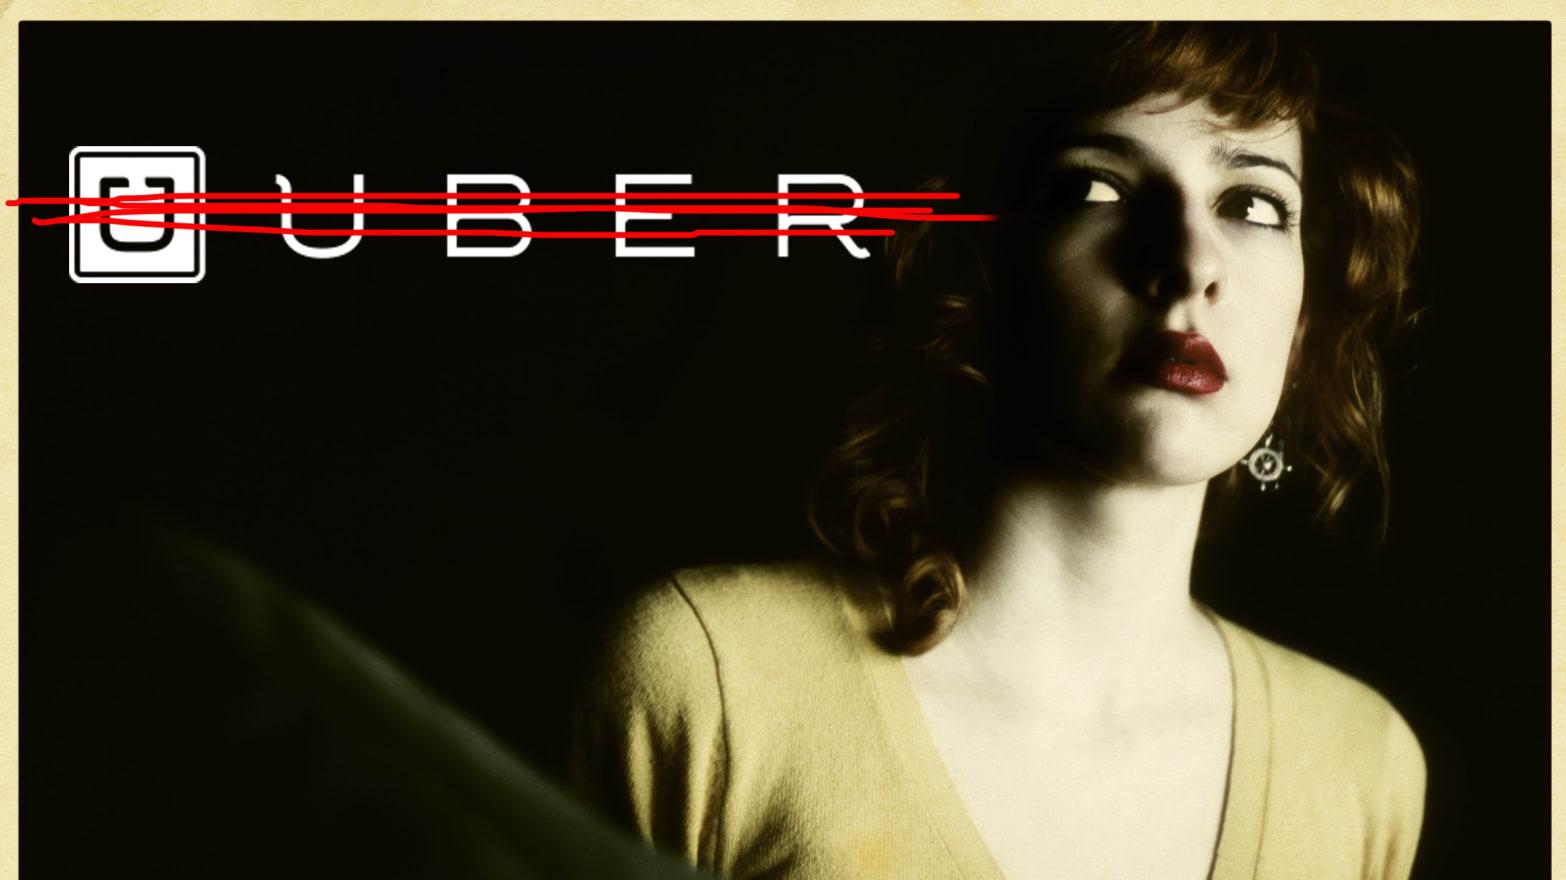 The Definitive List Of Uber Horror Stories